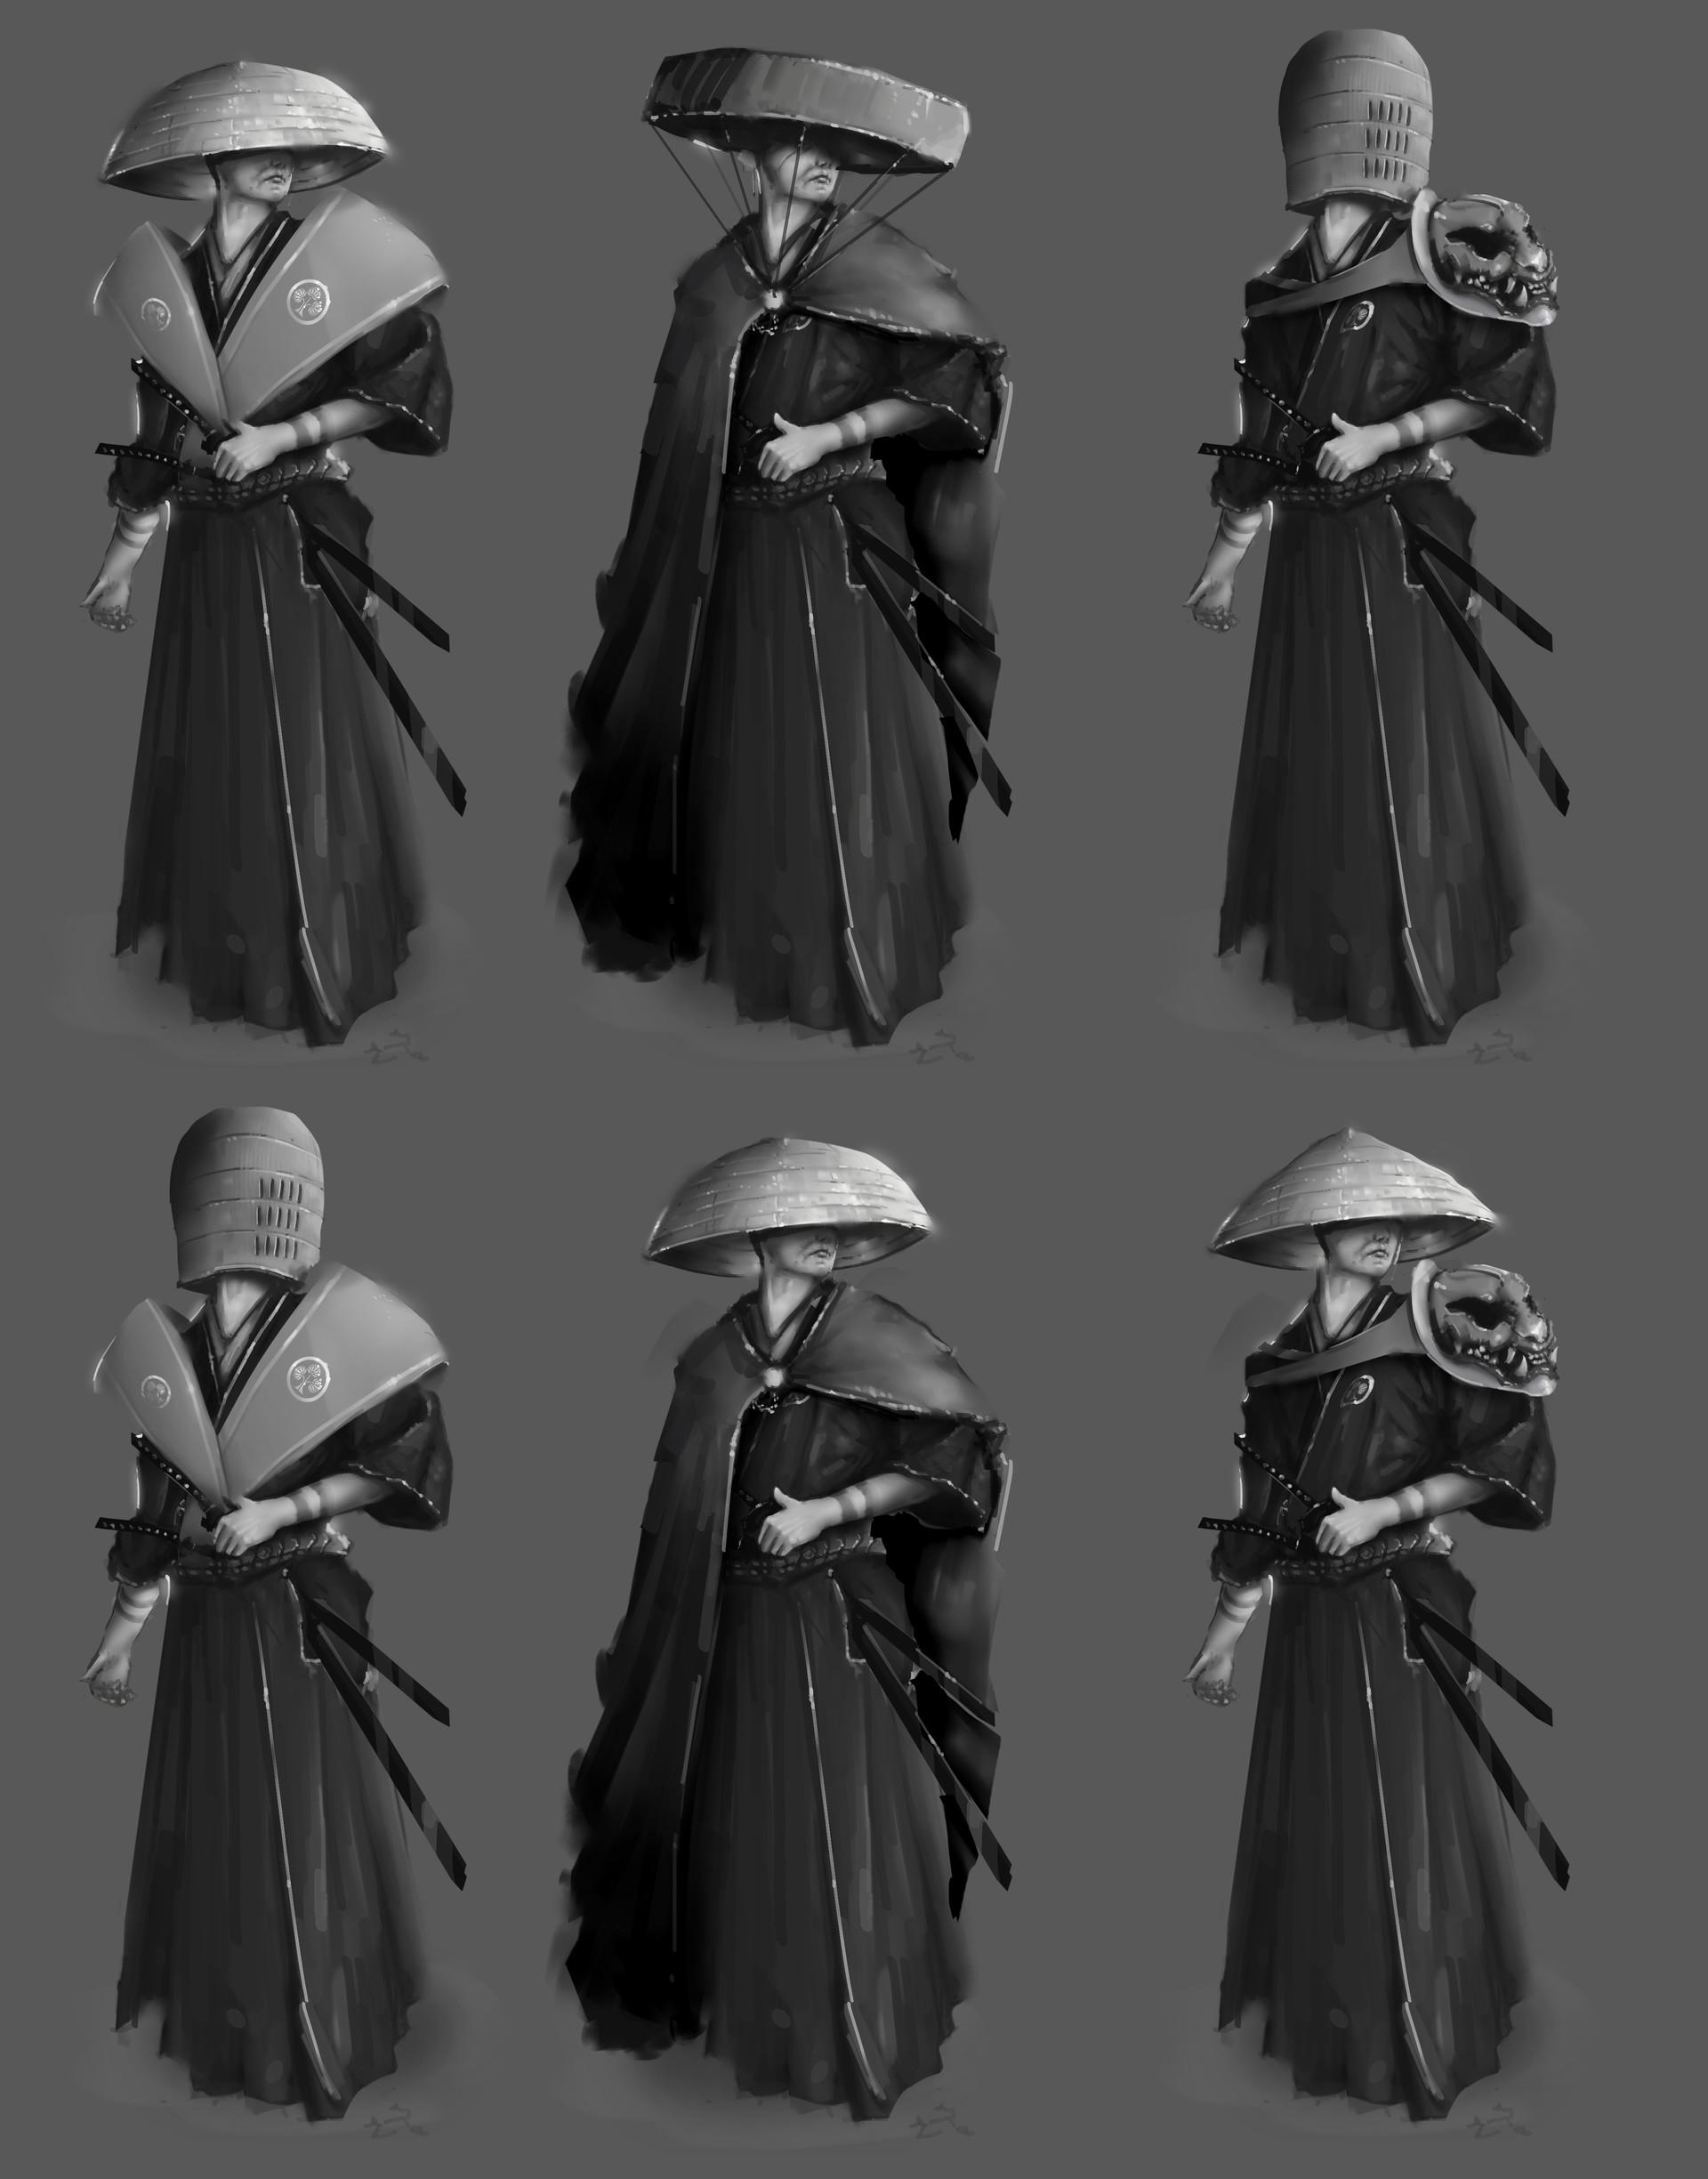 Boyan kazalov samuraiiterationsfinal